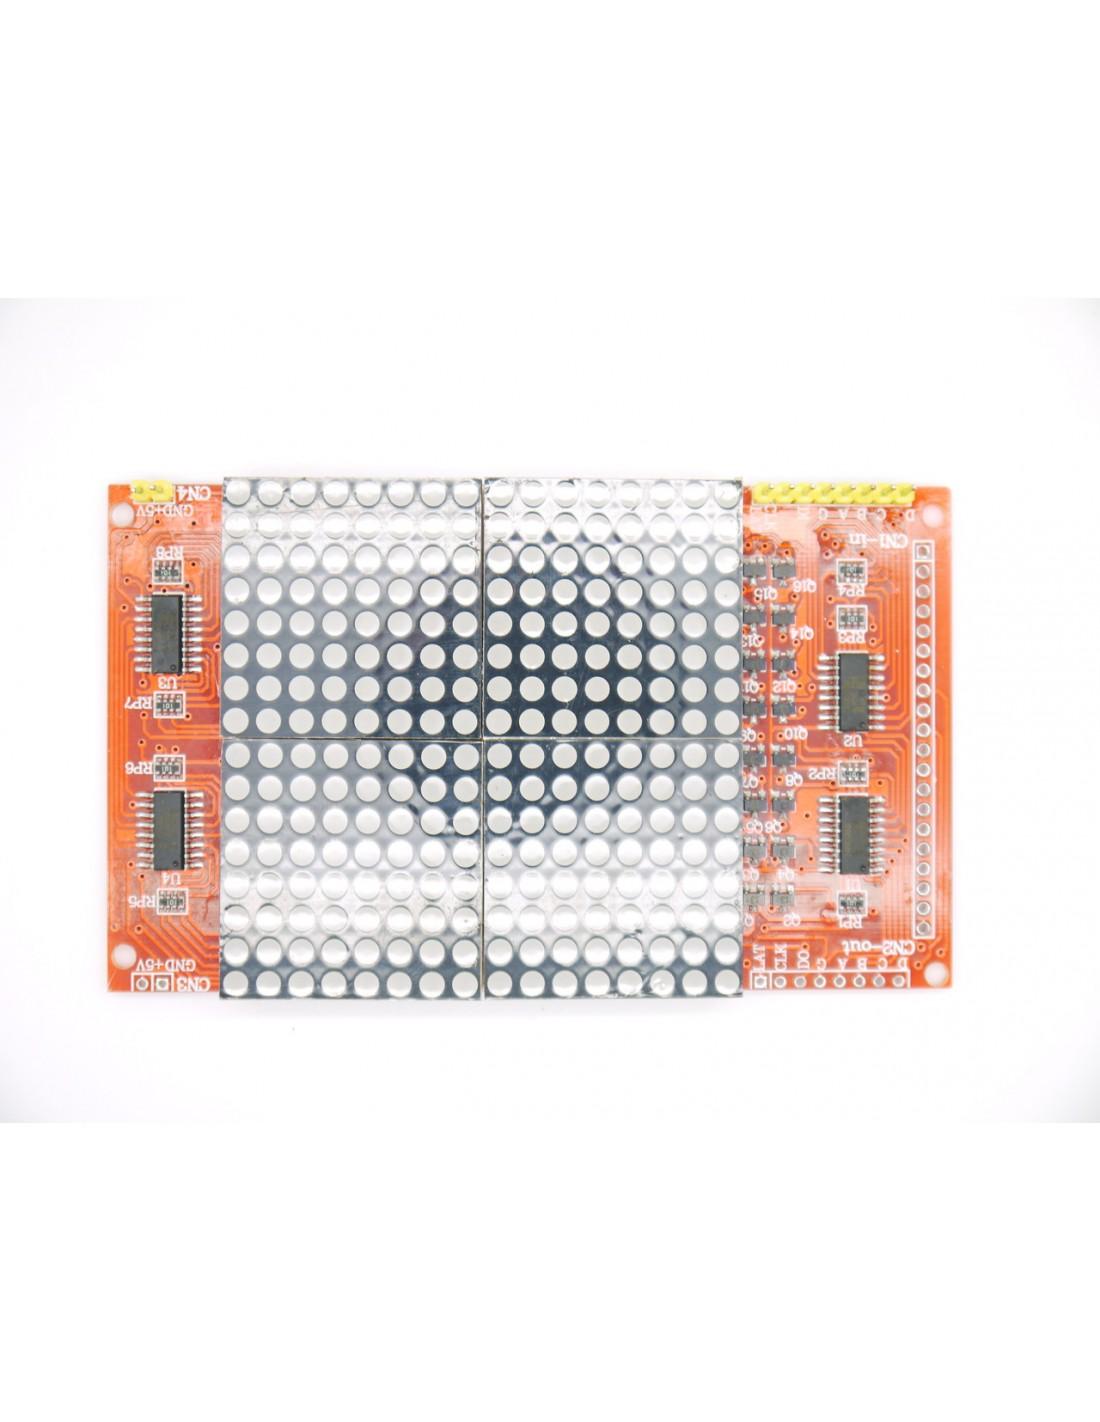 16×16 serial dot matrix led display module (screen)